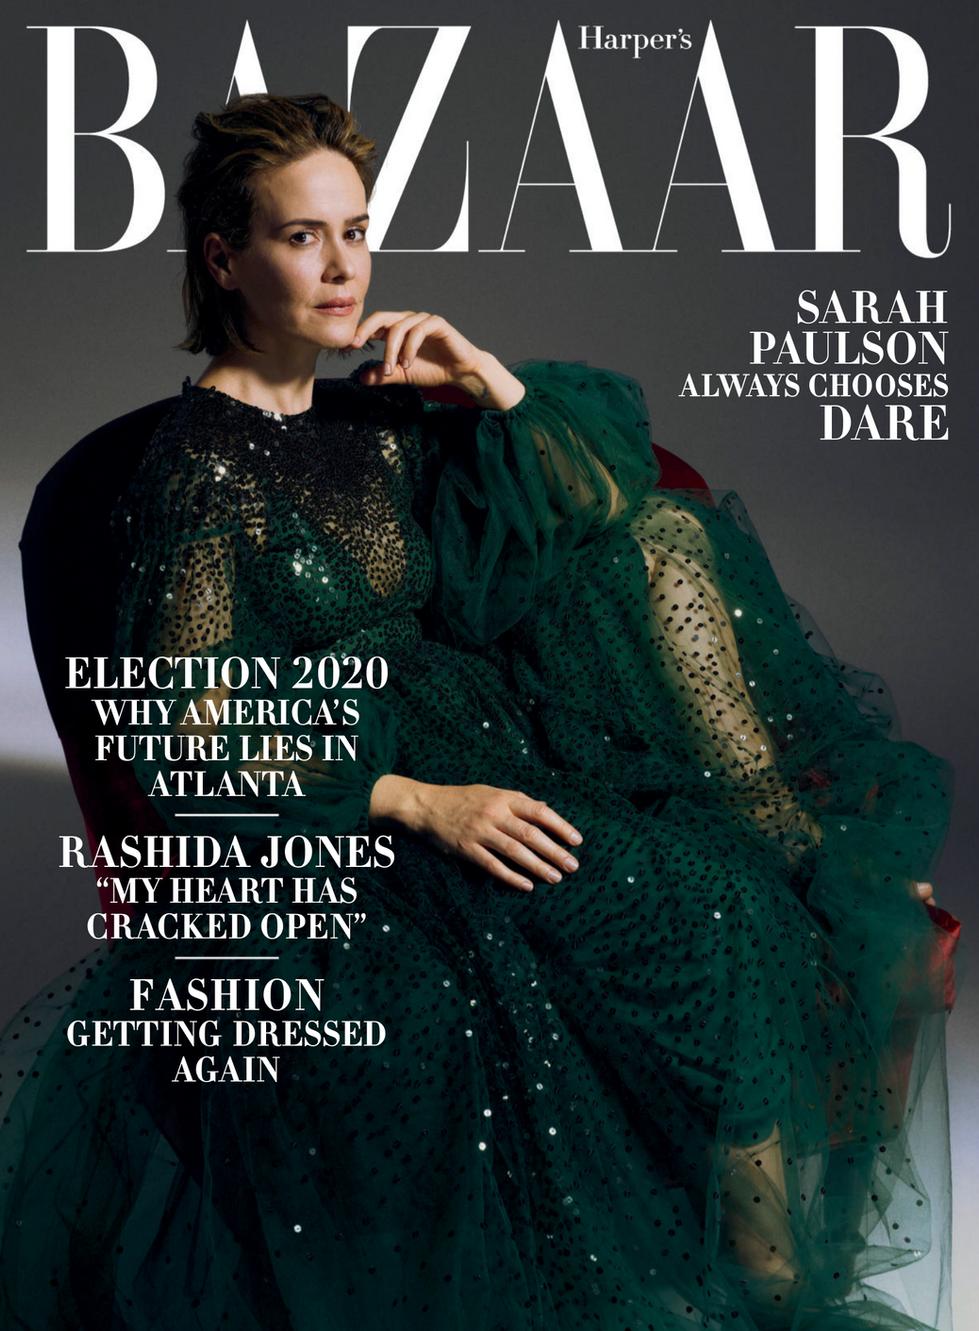 Haper's Bazzar 2020 Oct Issue